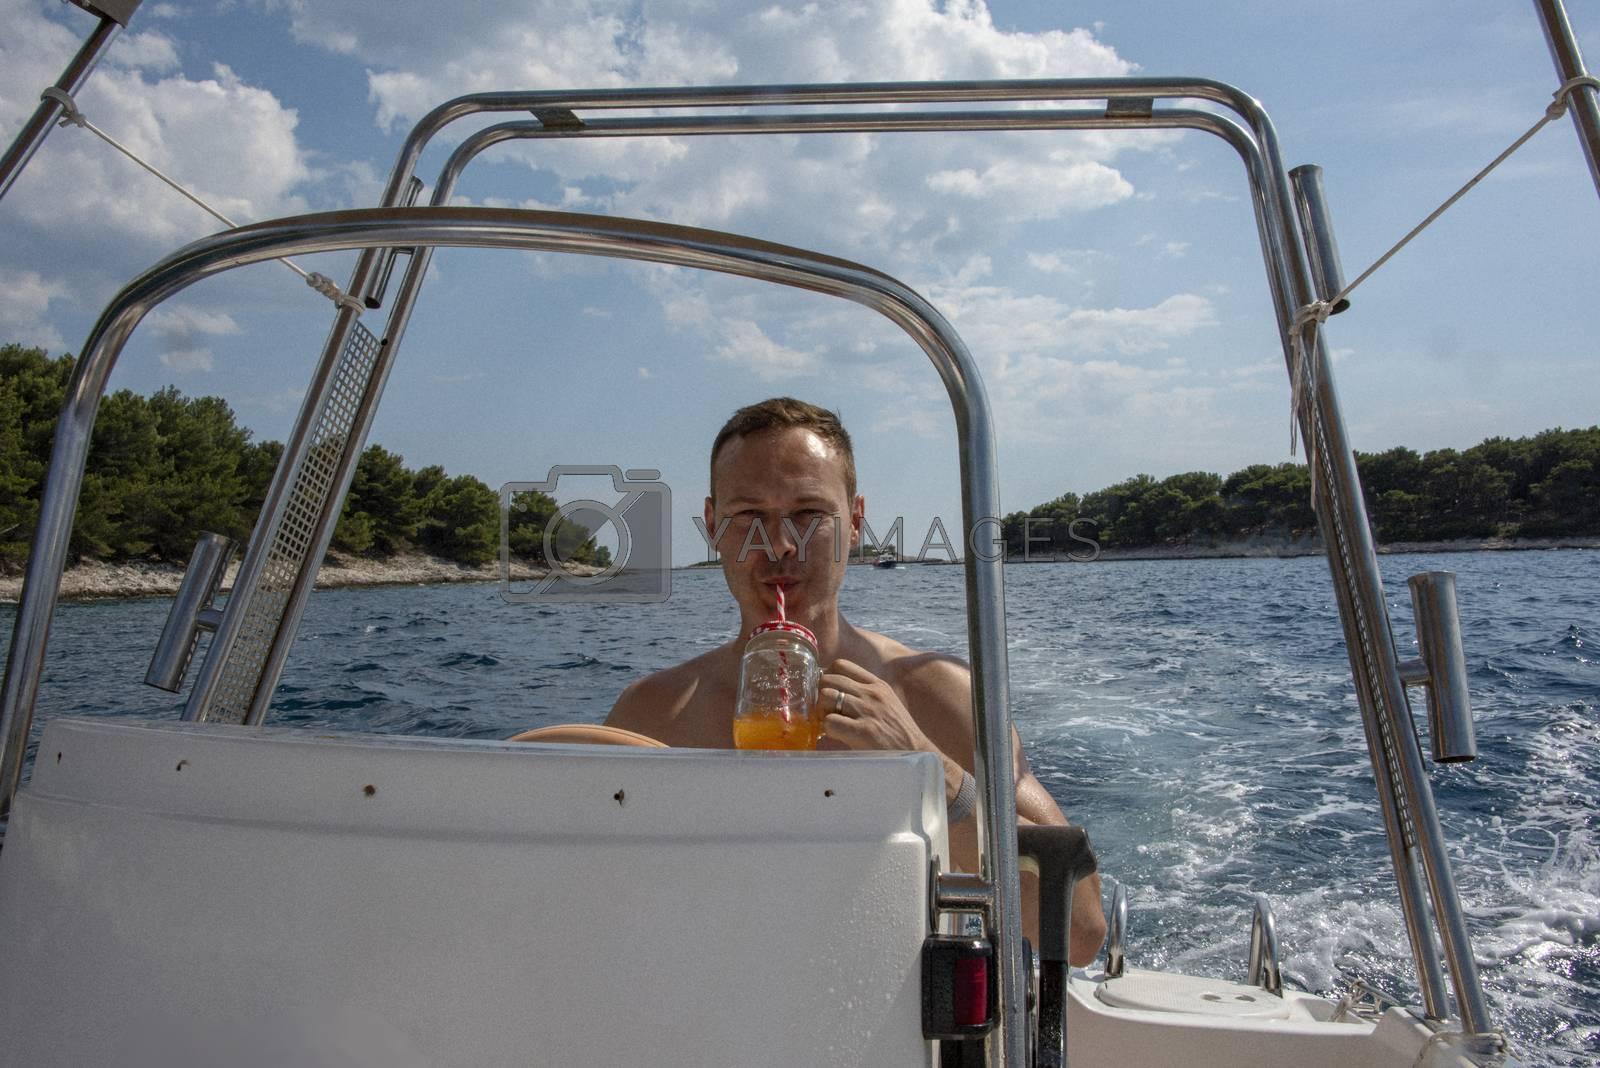 Croatia, Hvar - June 2018: Caucasian man, mid 40's drives a small boat on vacation